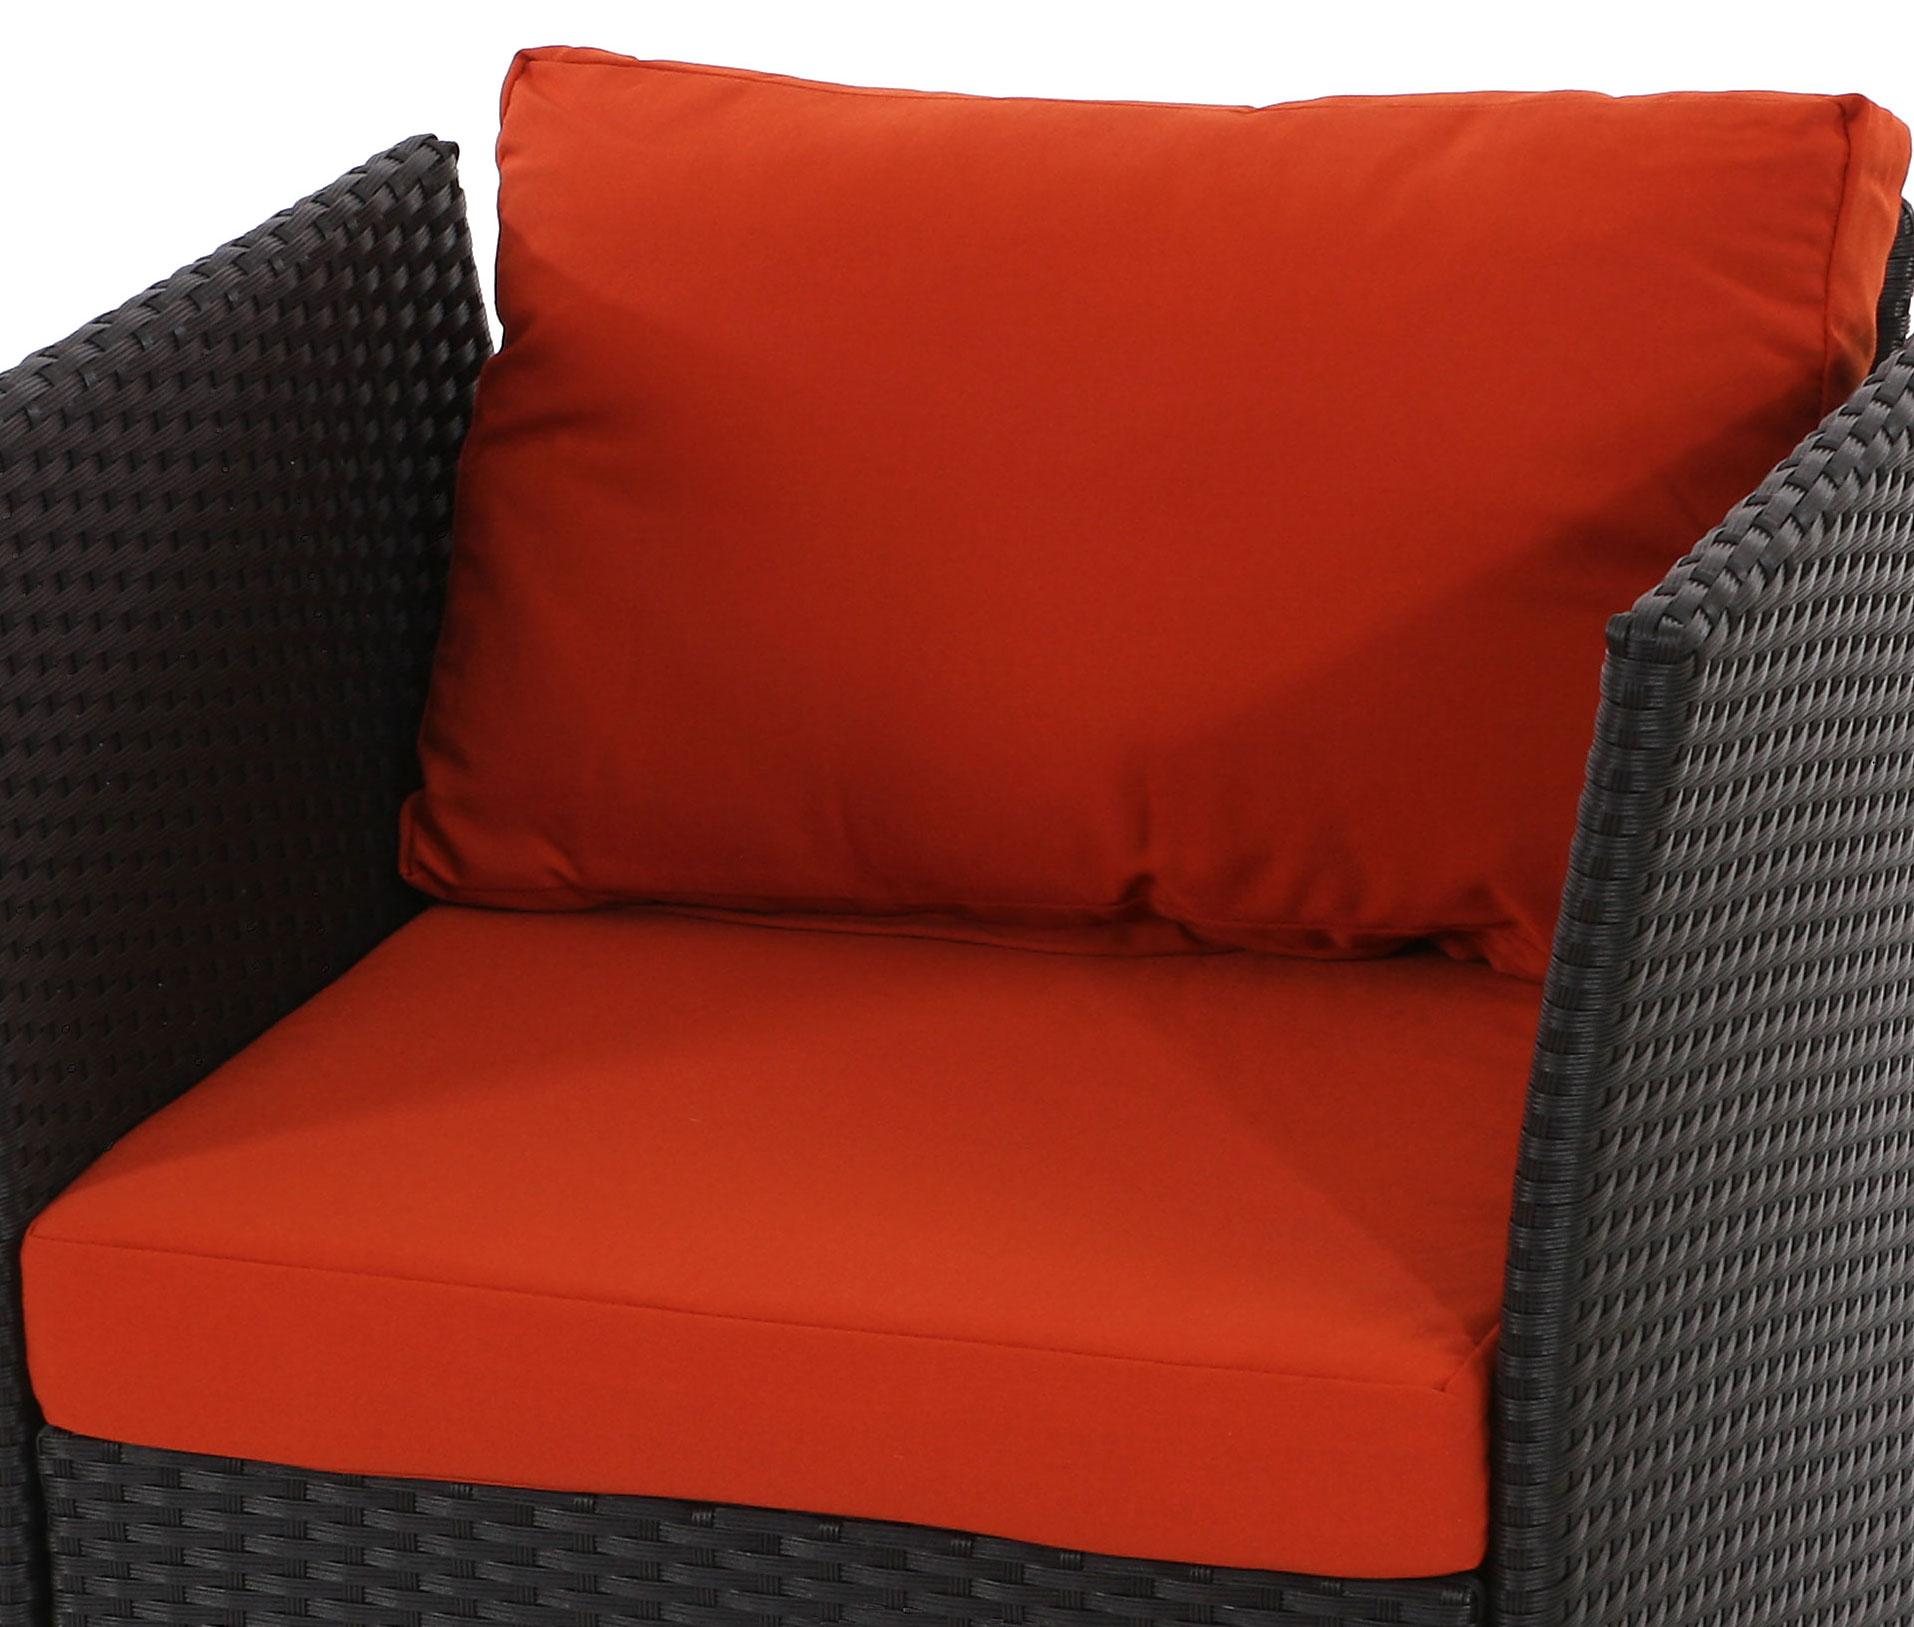 Poly rattan sofa siena modulare gastronomie qualit t for Sofa modular gris